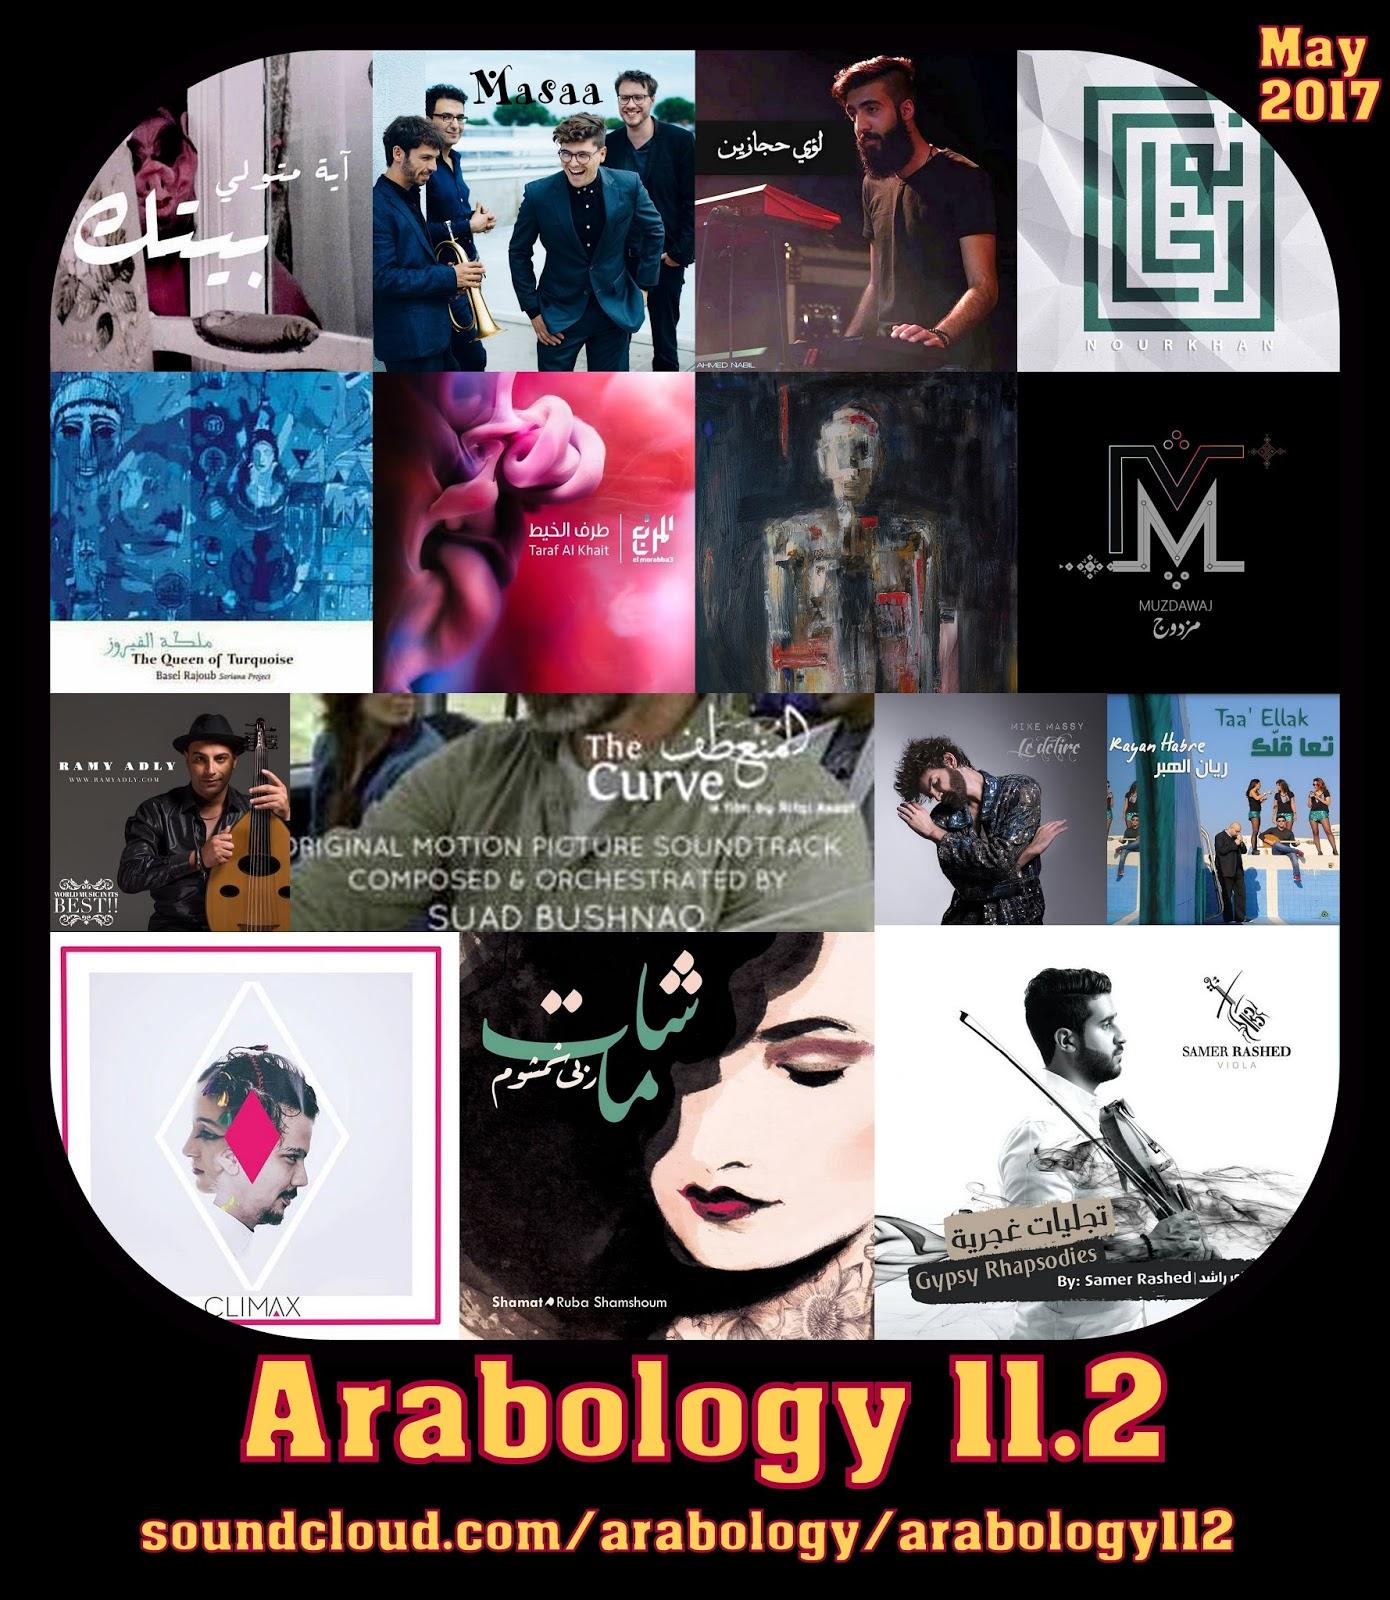 ARABOLOGY: May 2017 Arabology Podcast Ft Alternative Arabic